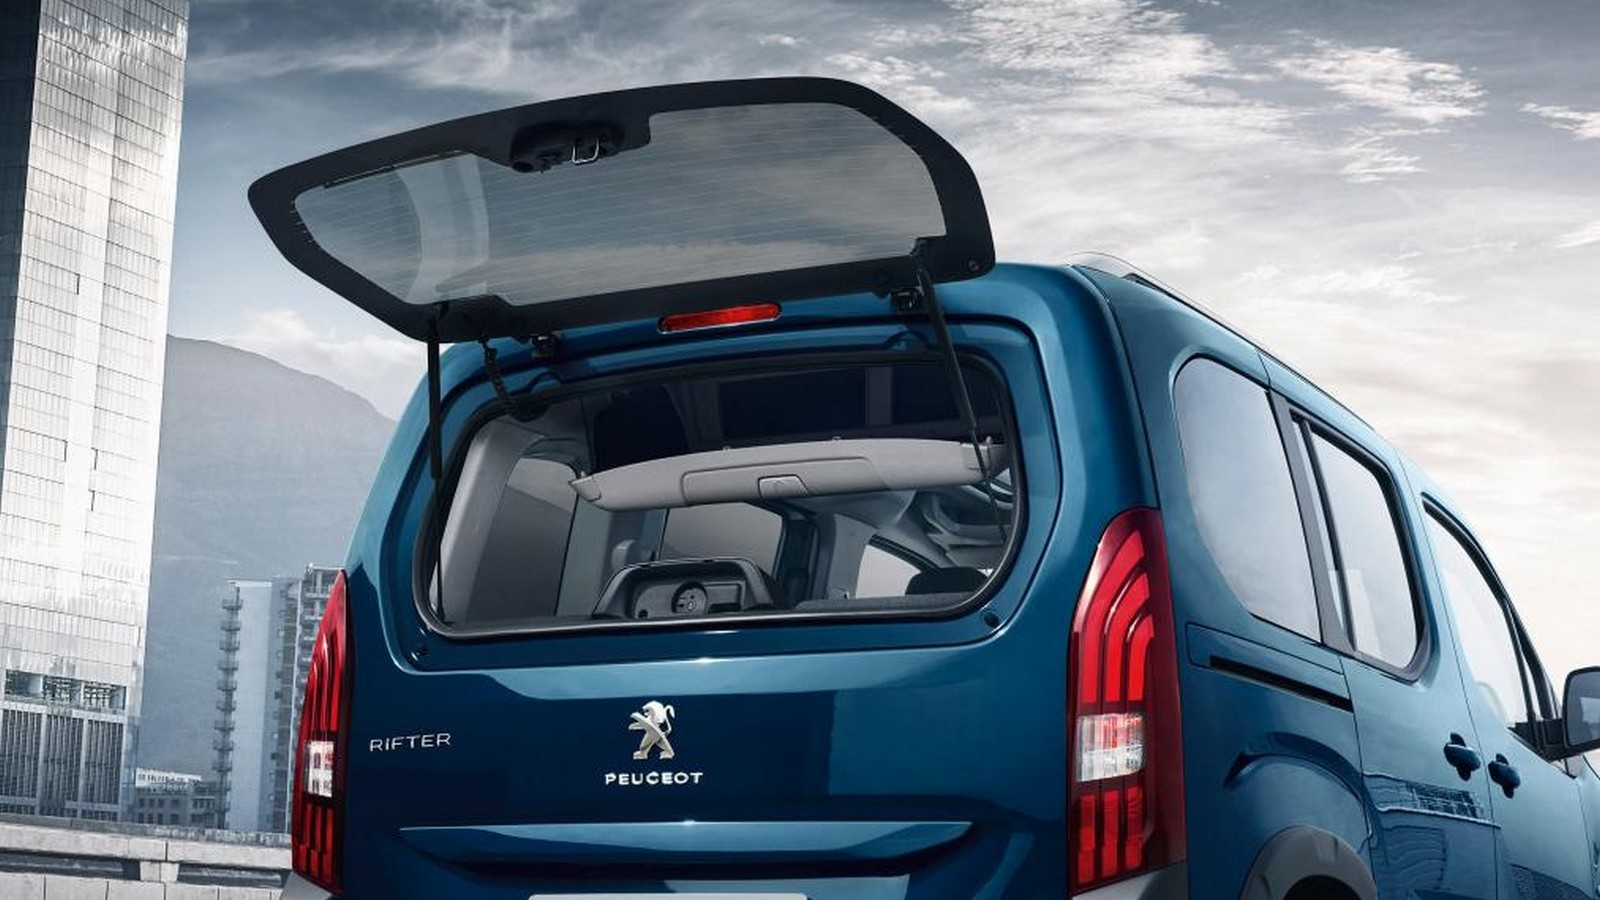 Foto de Peugeot Rifter 2018 (14/16)